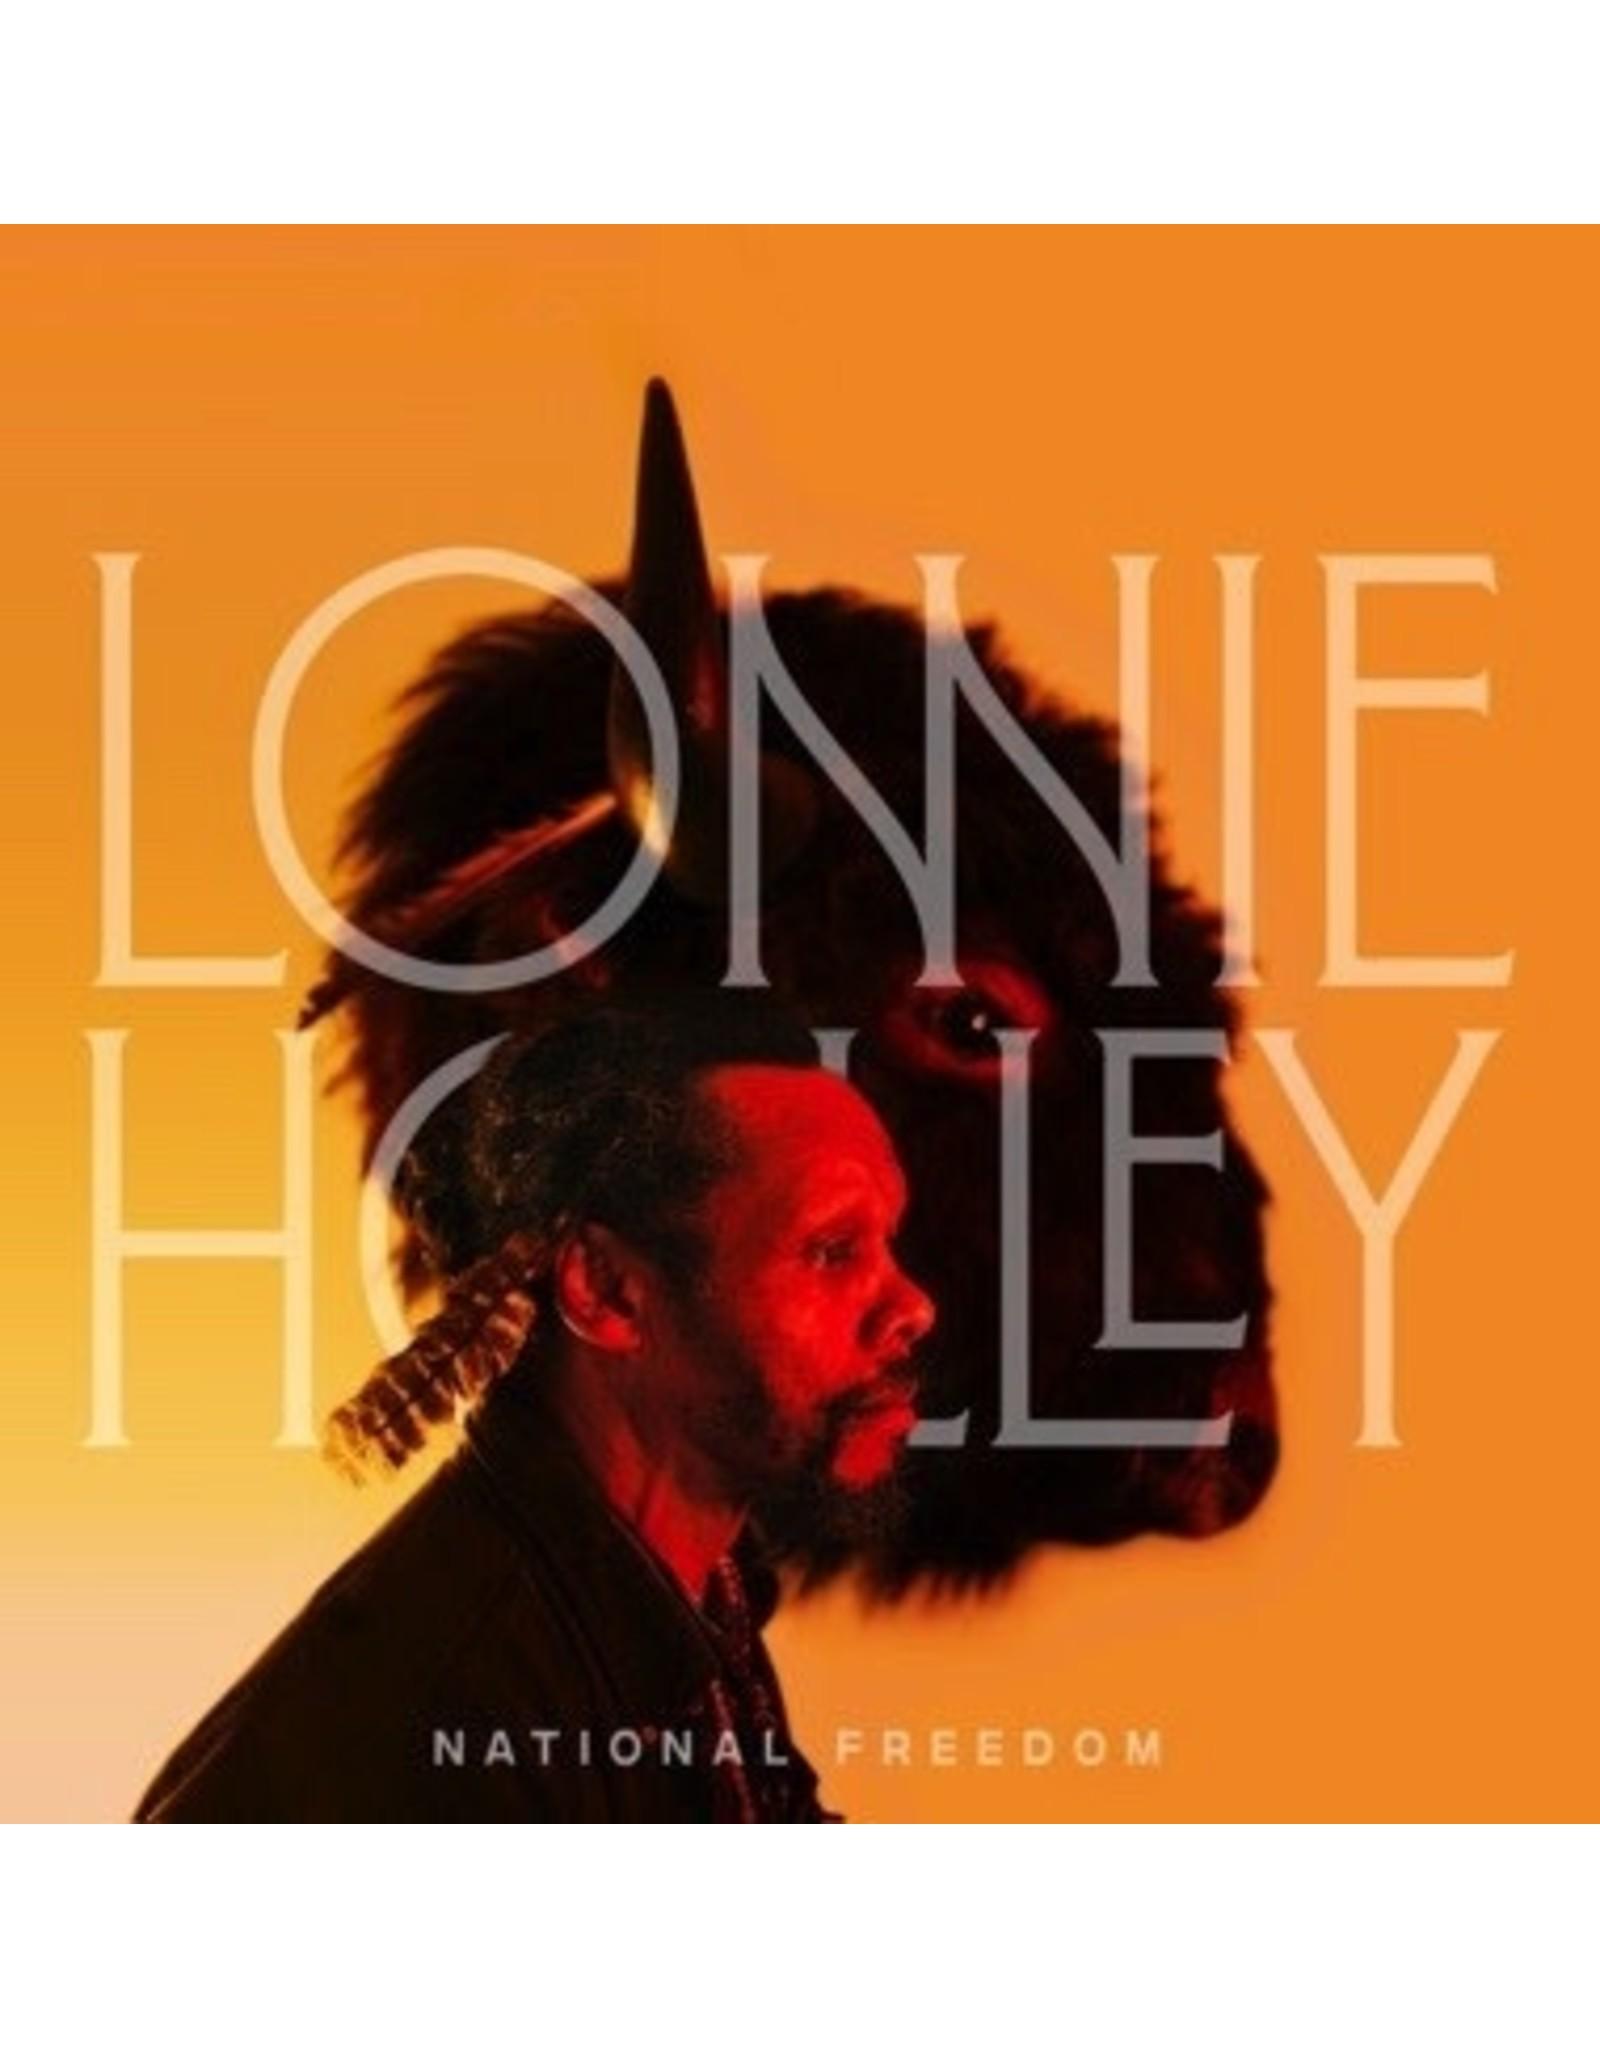 New Vinyl Lonnie Holley - National Freedom LP